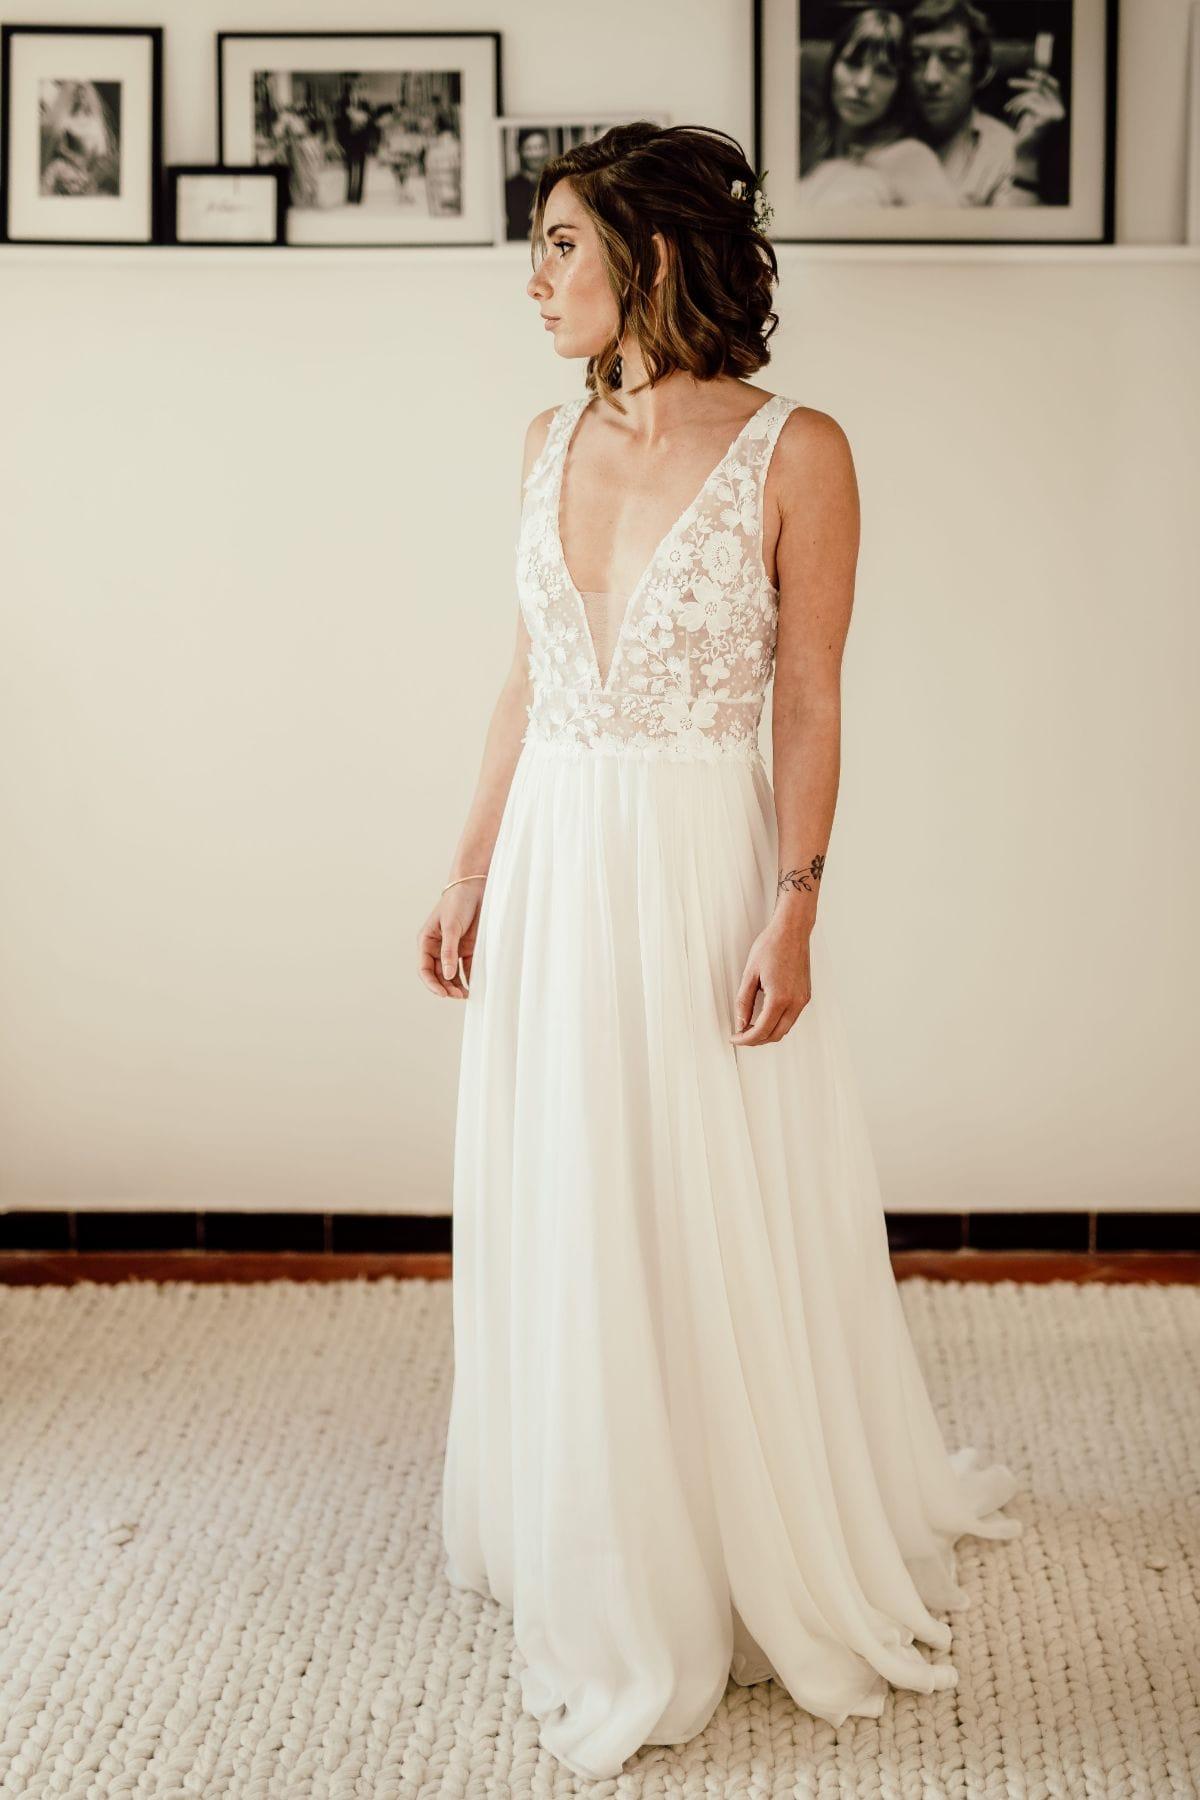 Camille Recollin - Robes de mariée Collection